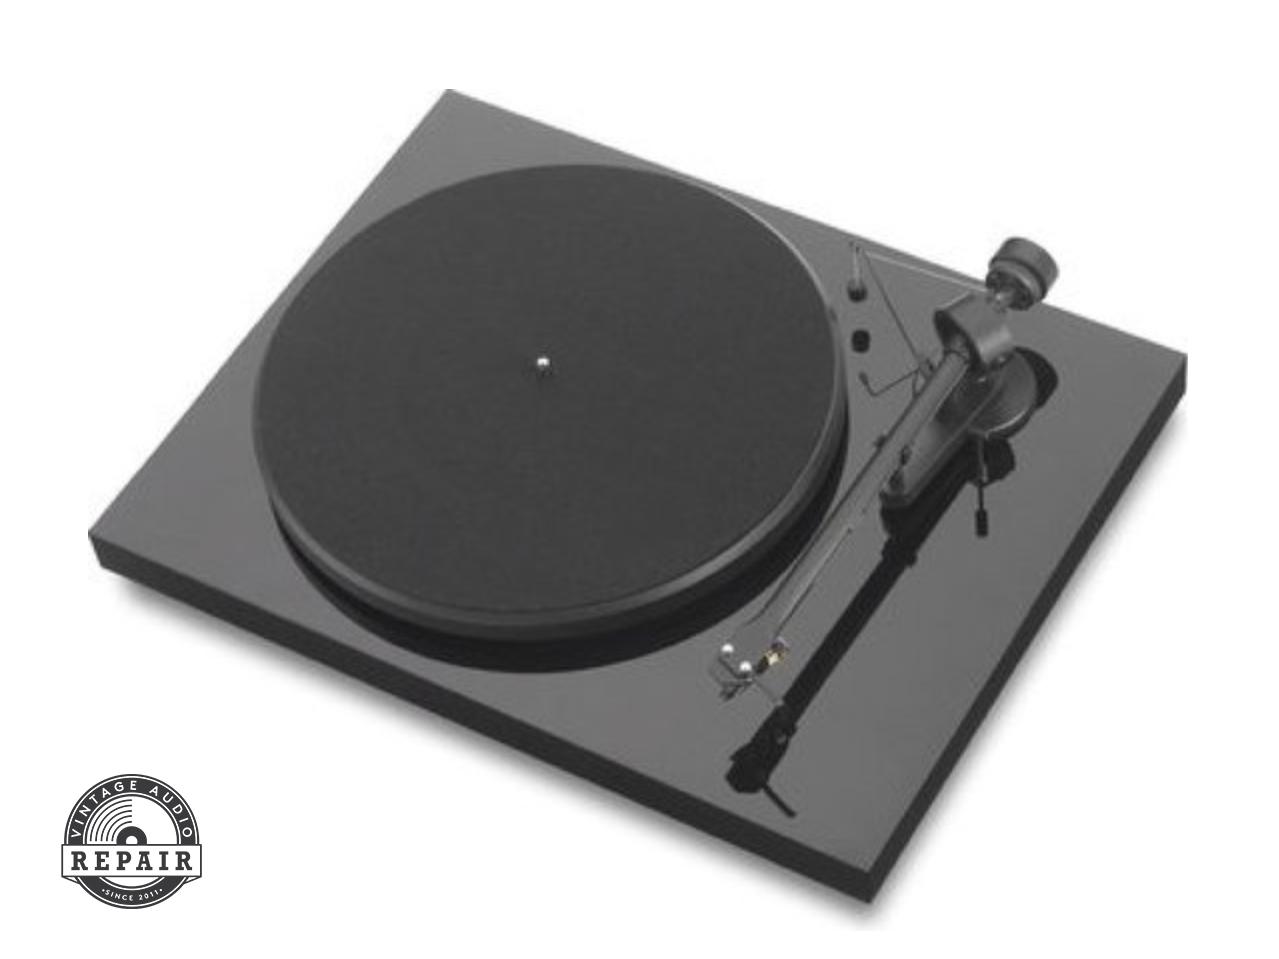 Pro Ject Debut III DC OM5E Vintage Audio Repair